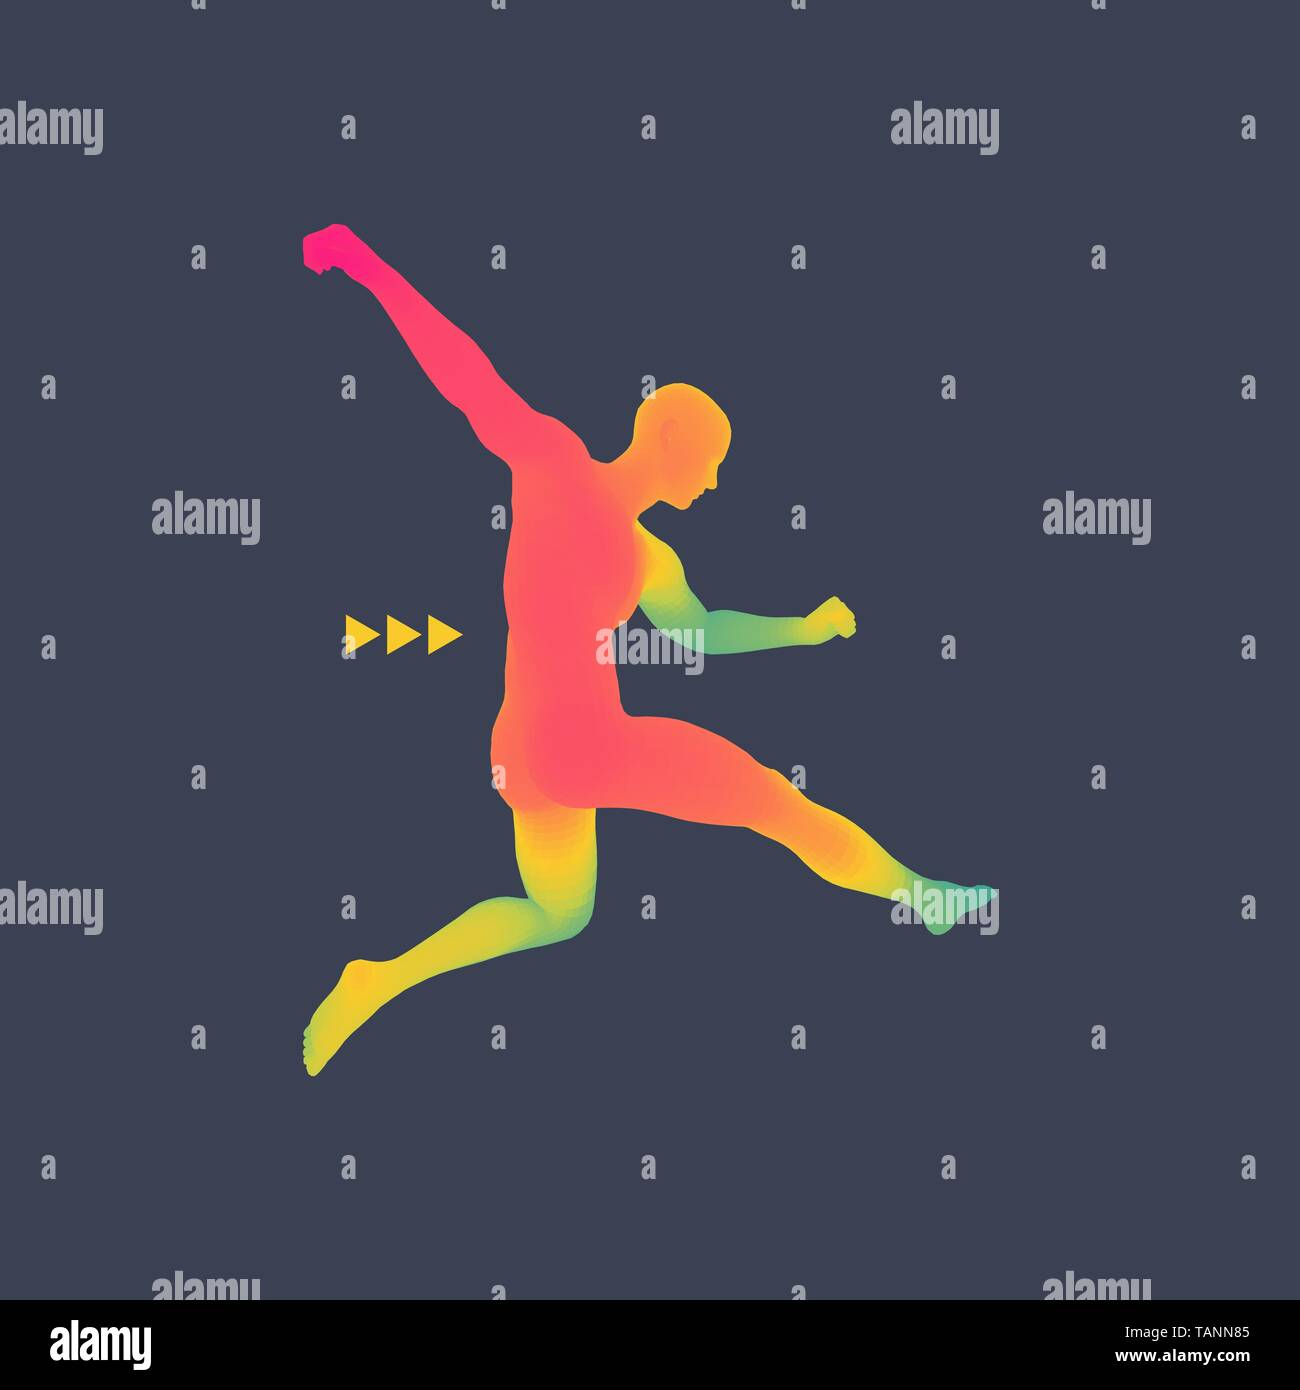 Football player. Sports concept. 3D Model of Man. Human Body. Sport Symbol. Design Element. Vector Illustration. - Stock Vector